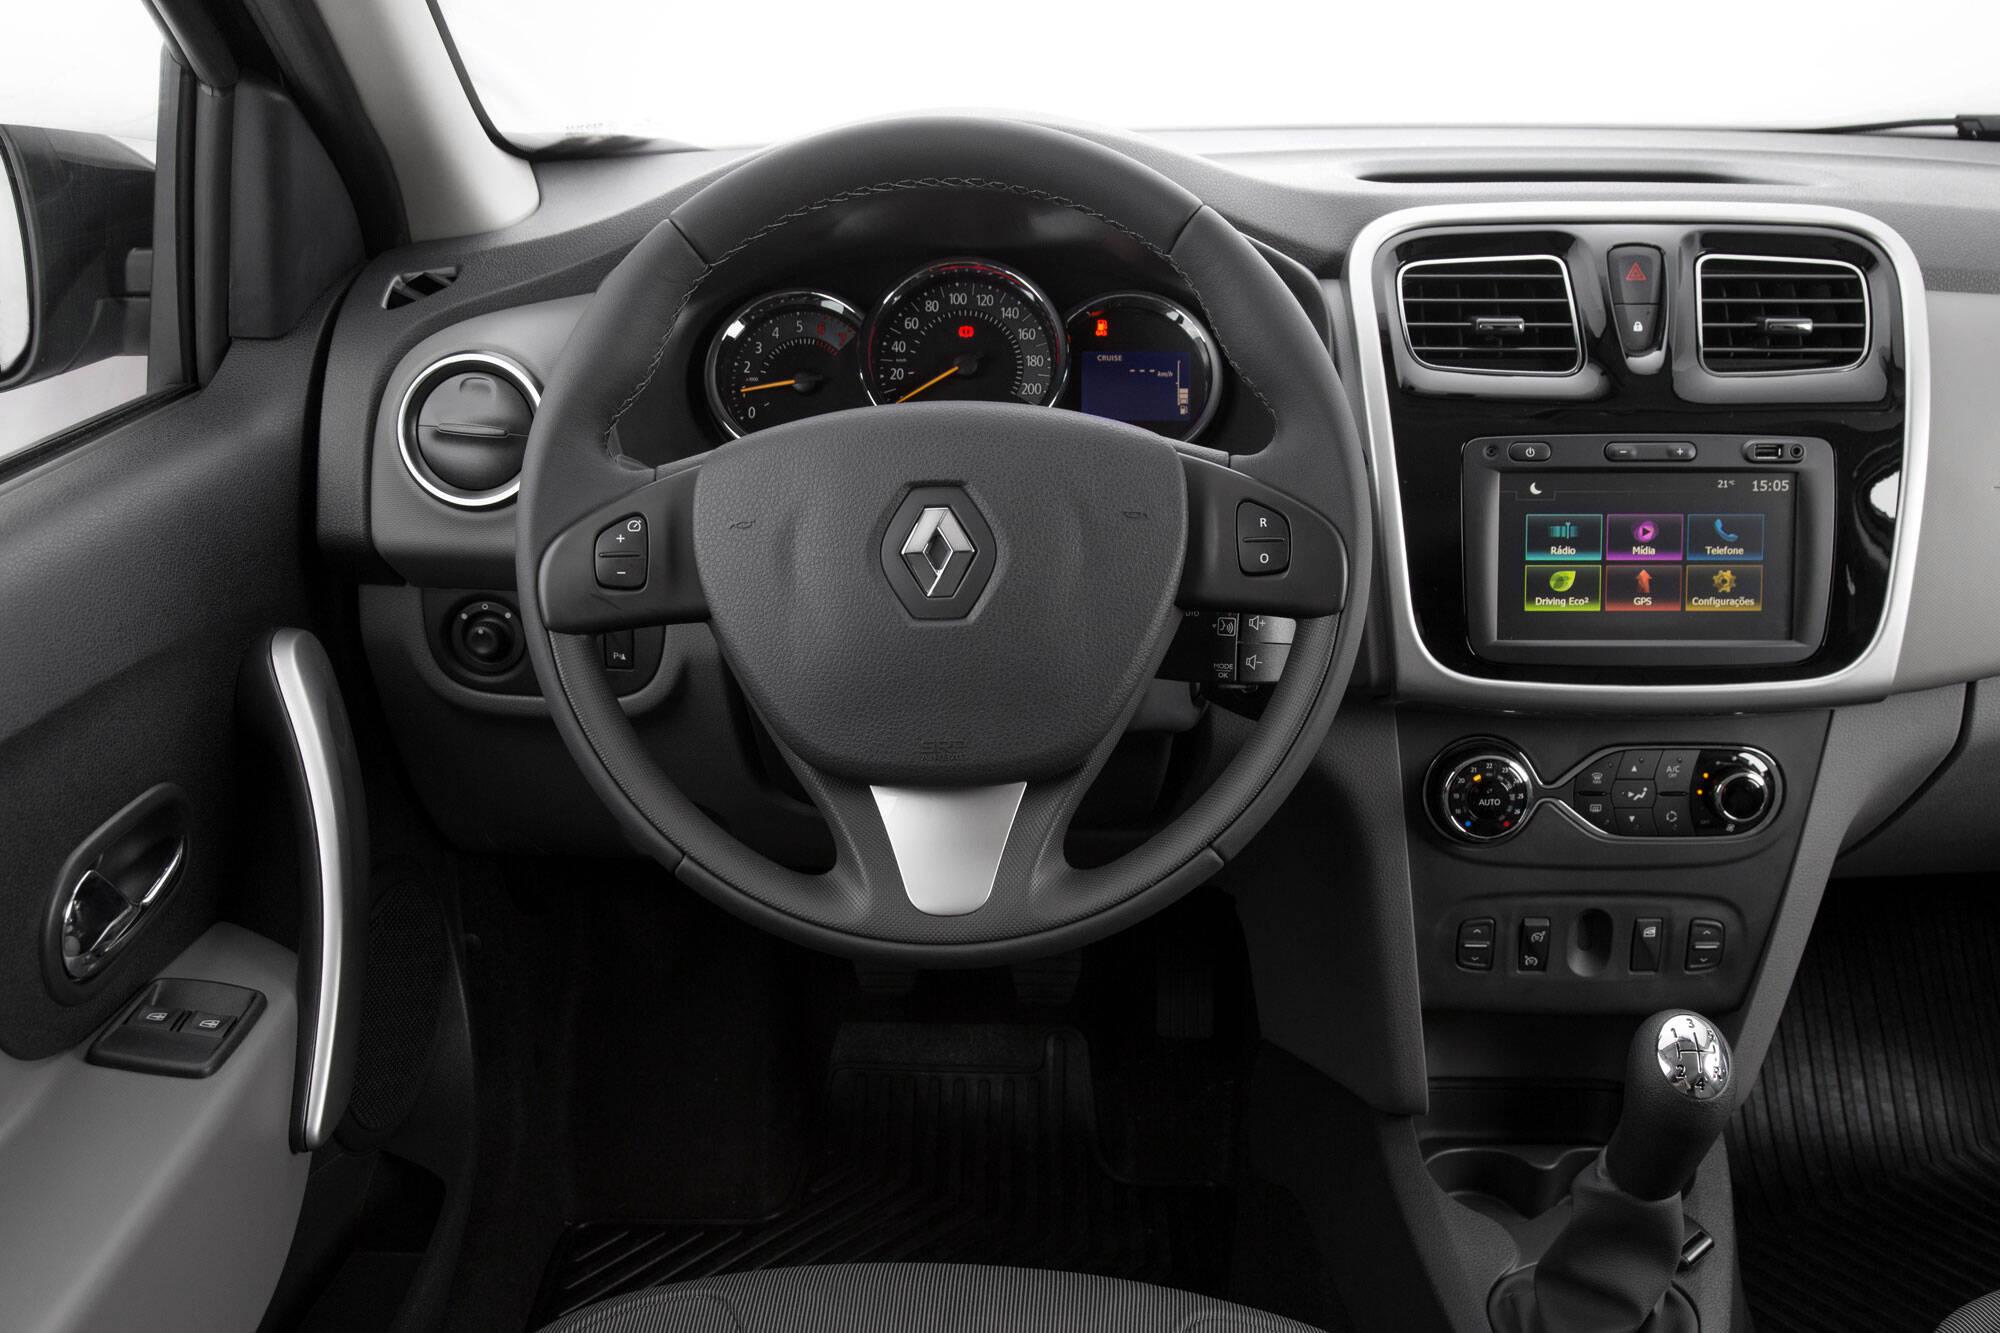 Renault Logan 1.6 SCe. Foto: divulgação/Renault